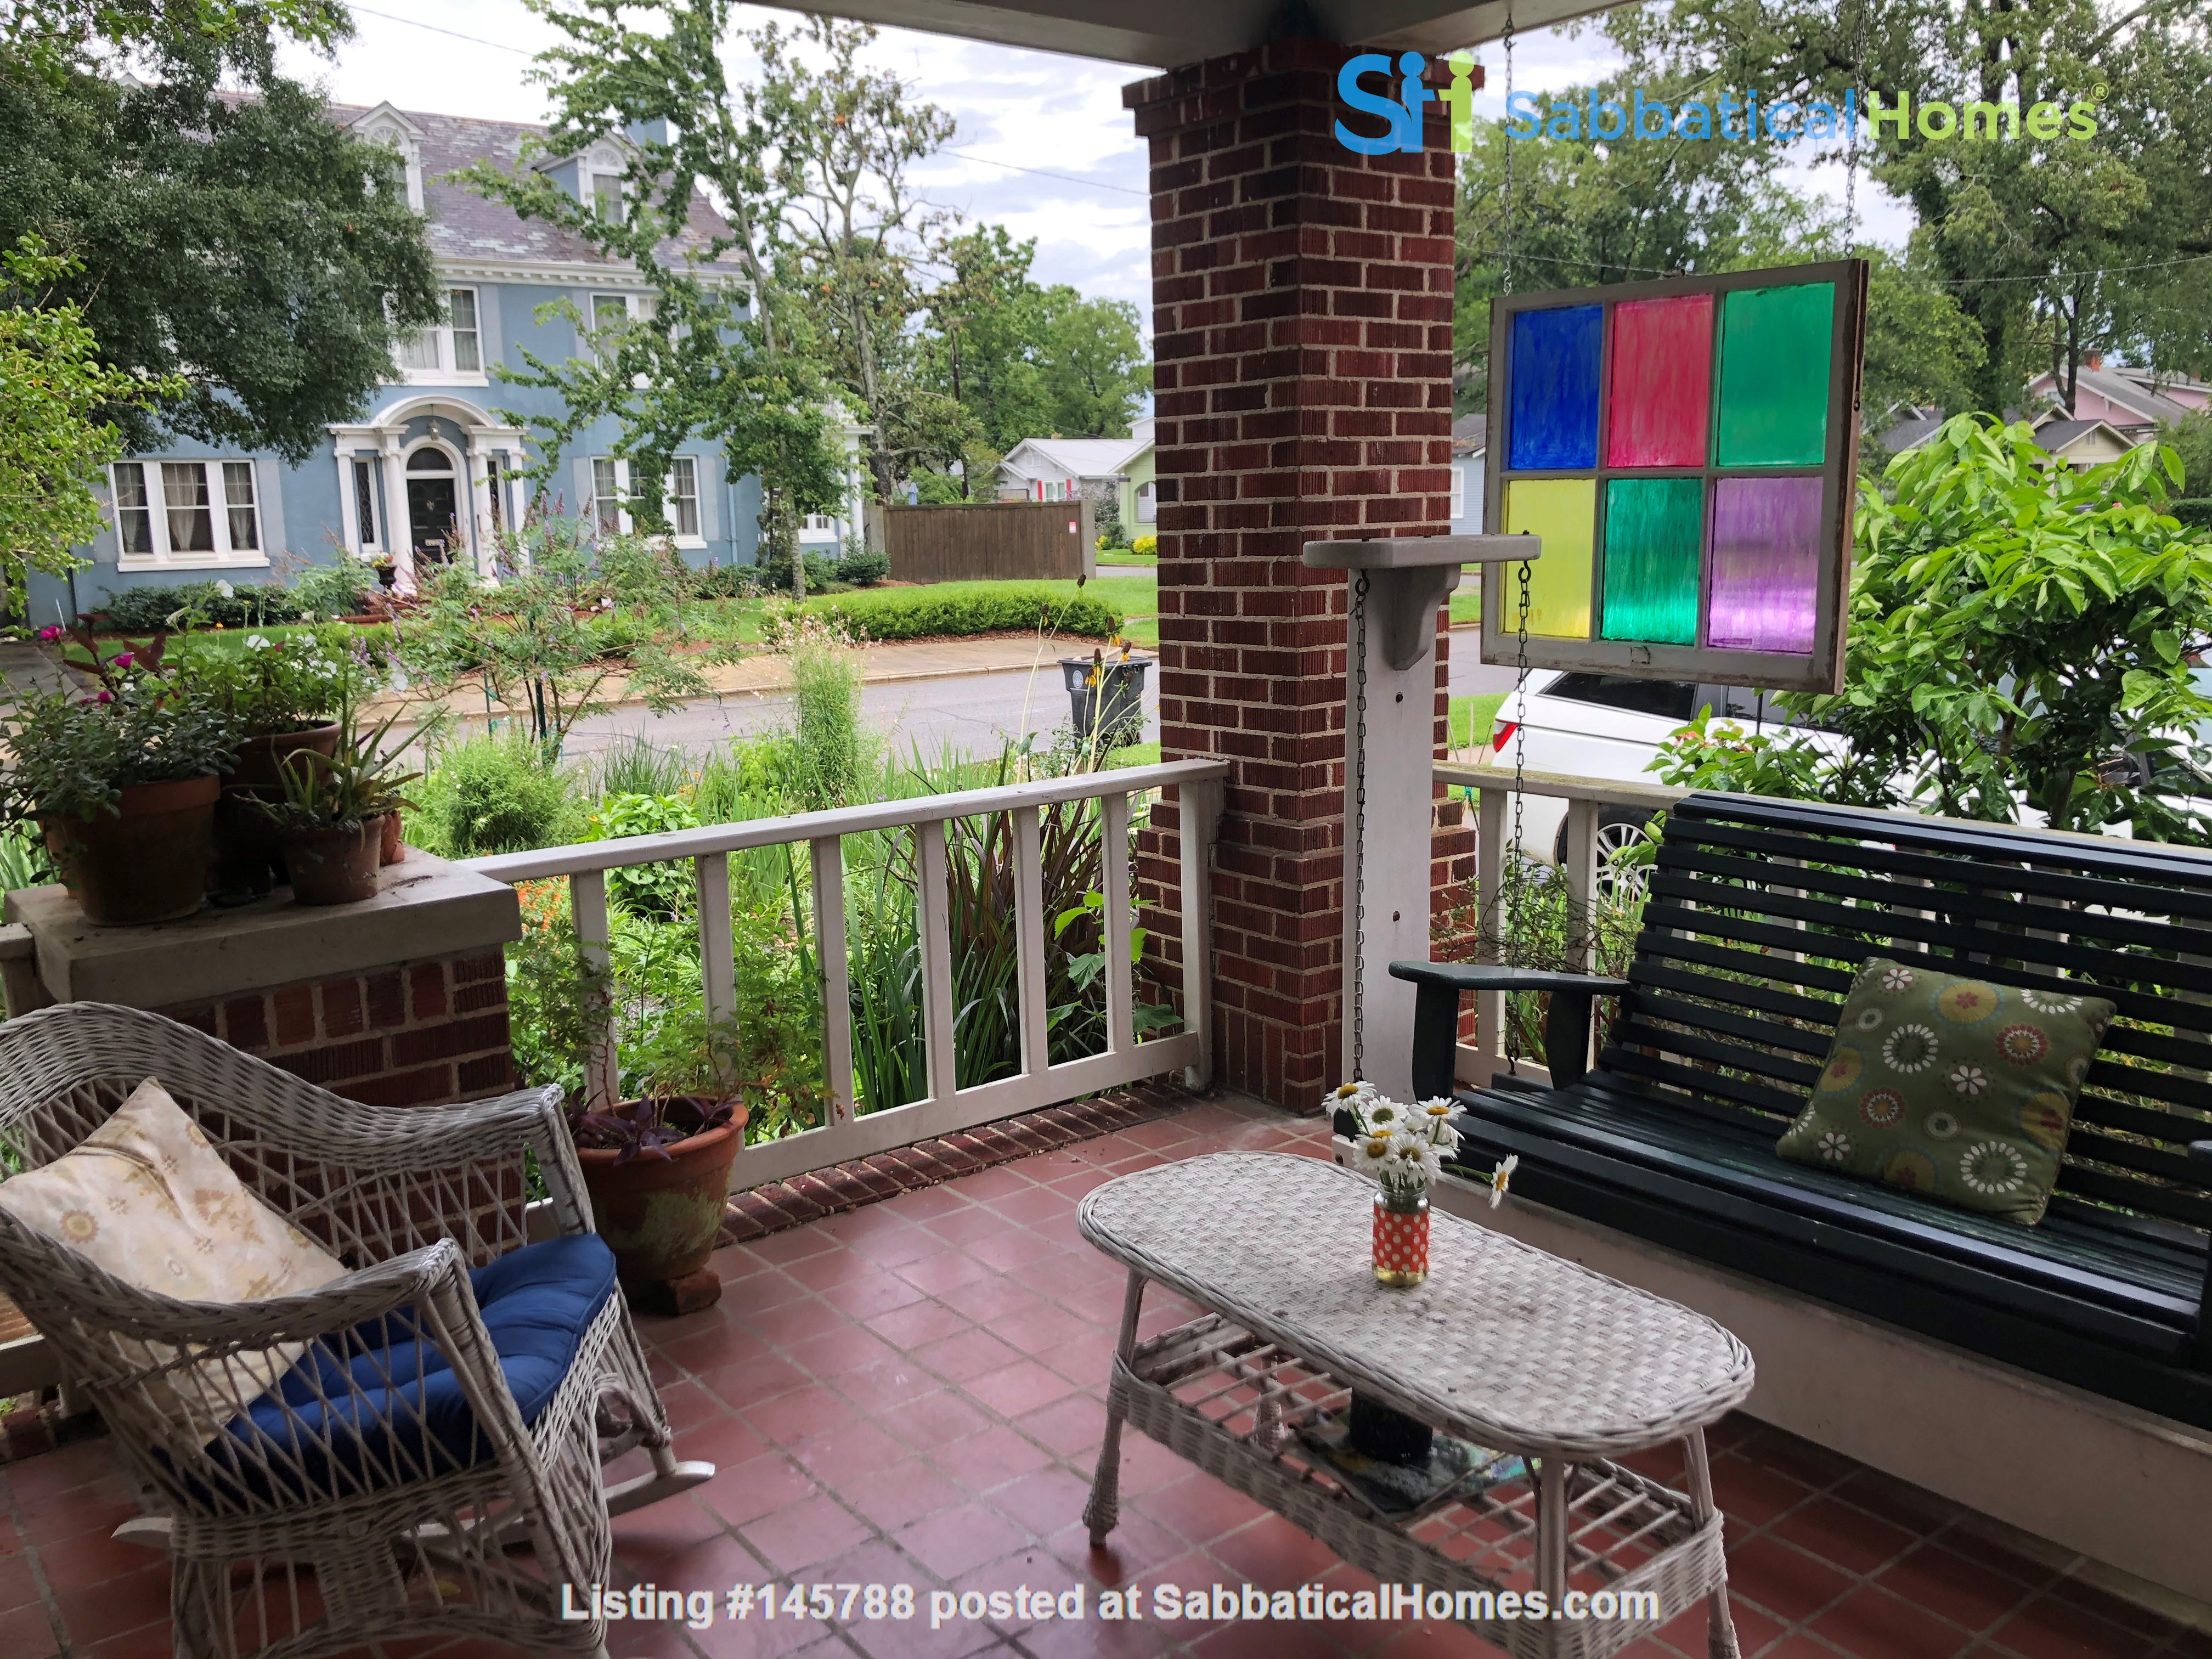 Charming 3 bedroom bungalow in Baton Rouge, Louisiana near LSU Home Rental in Baton Rouge 1